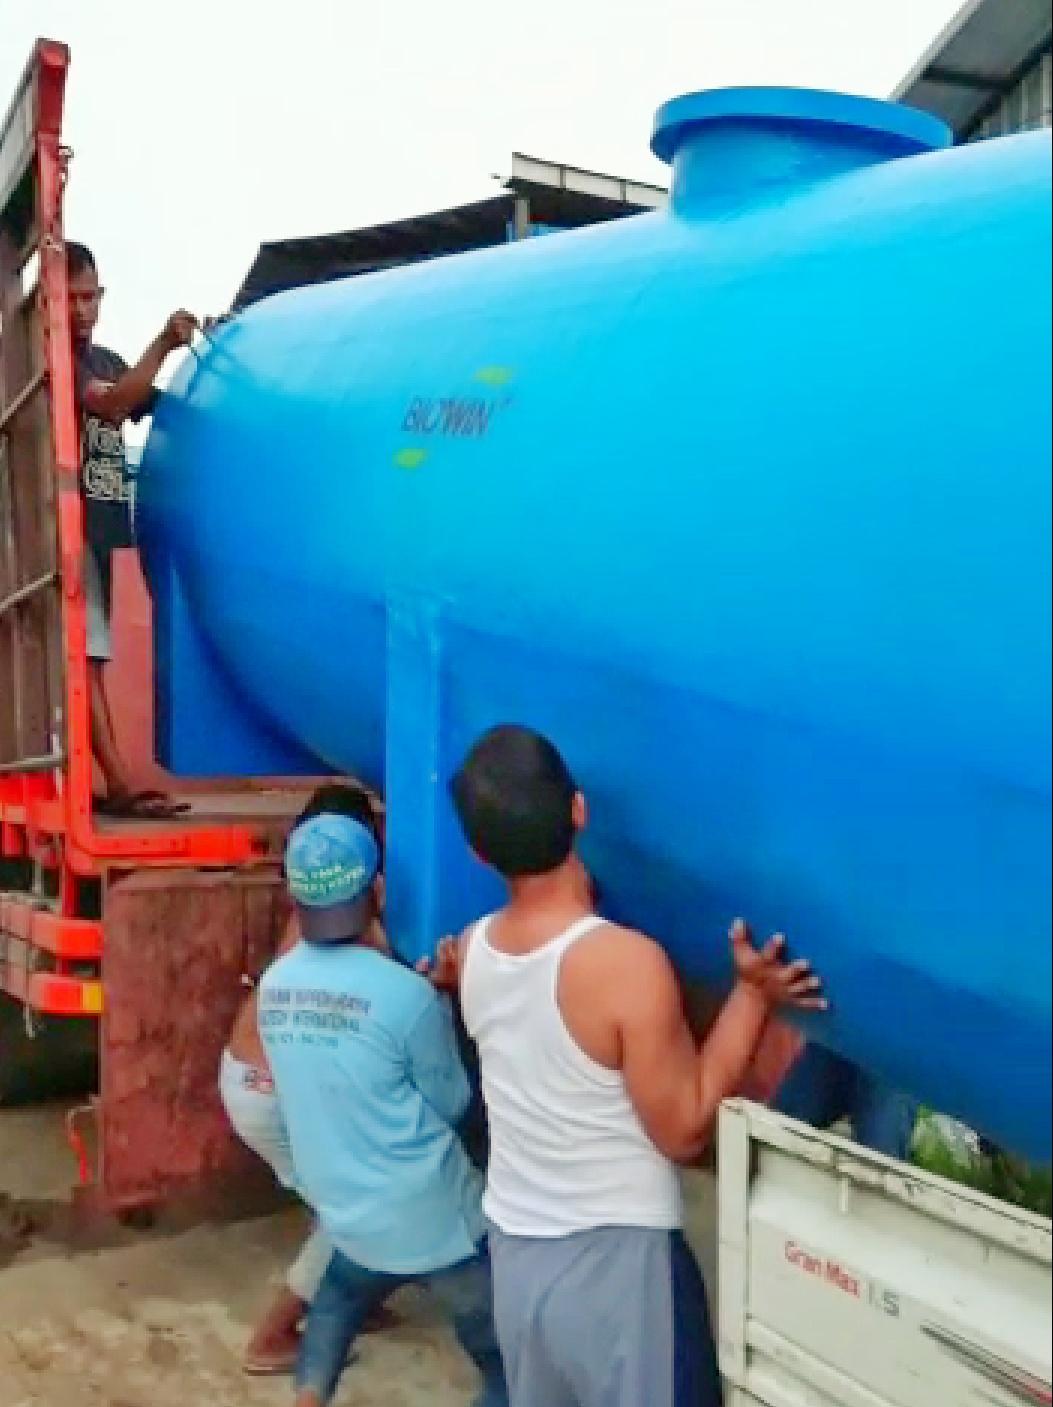 Sewa Truk Tangerang Magelang, Sewa Truk Magelang